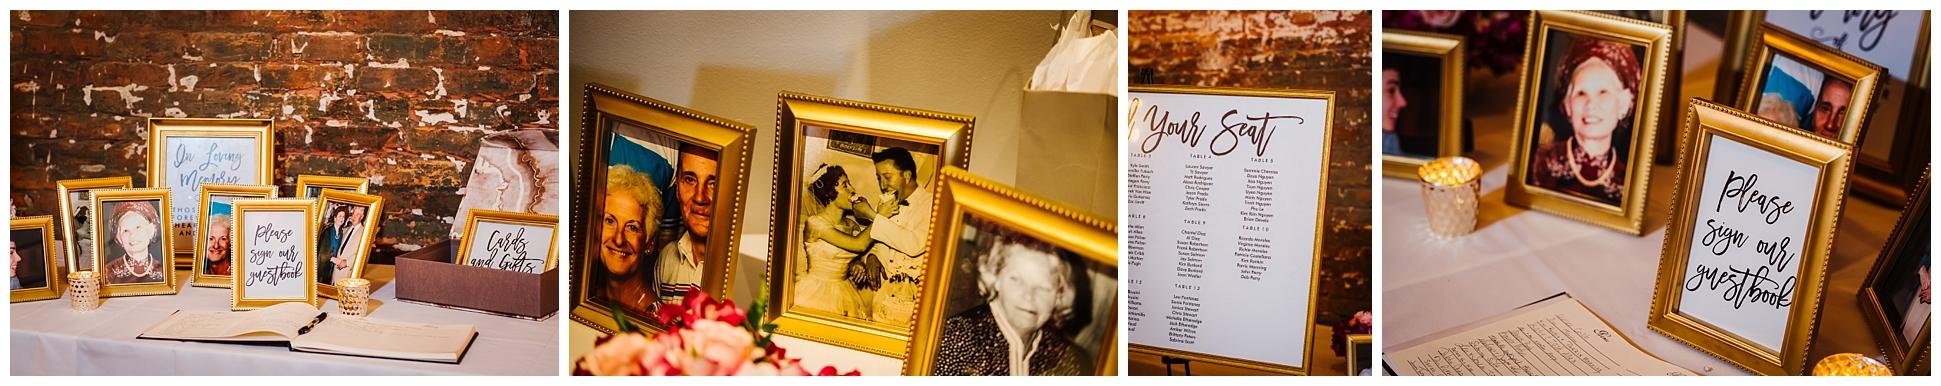 tampa-armeture-wedding-photographer-edgy-industrial-downtown-fancy-free-nursery-tattoo-burgandy-velvet_0067.jpg